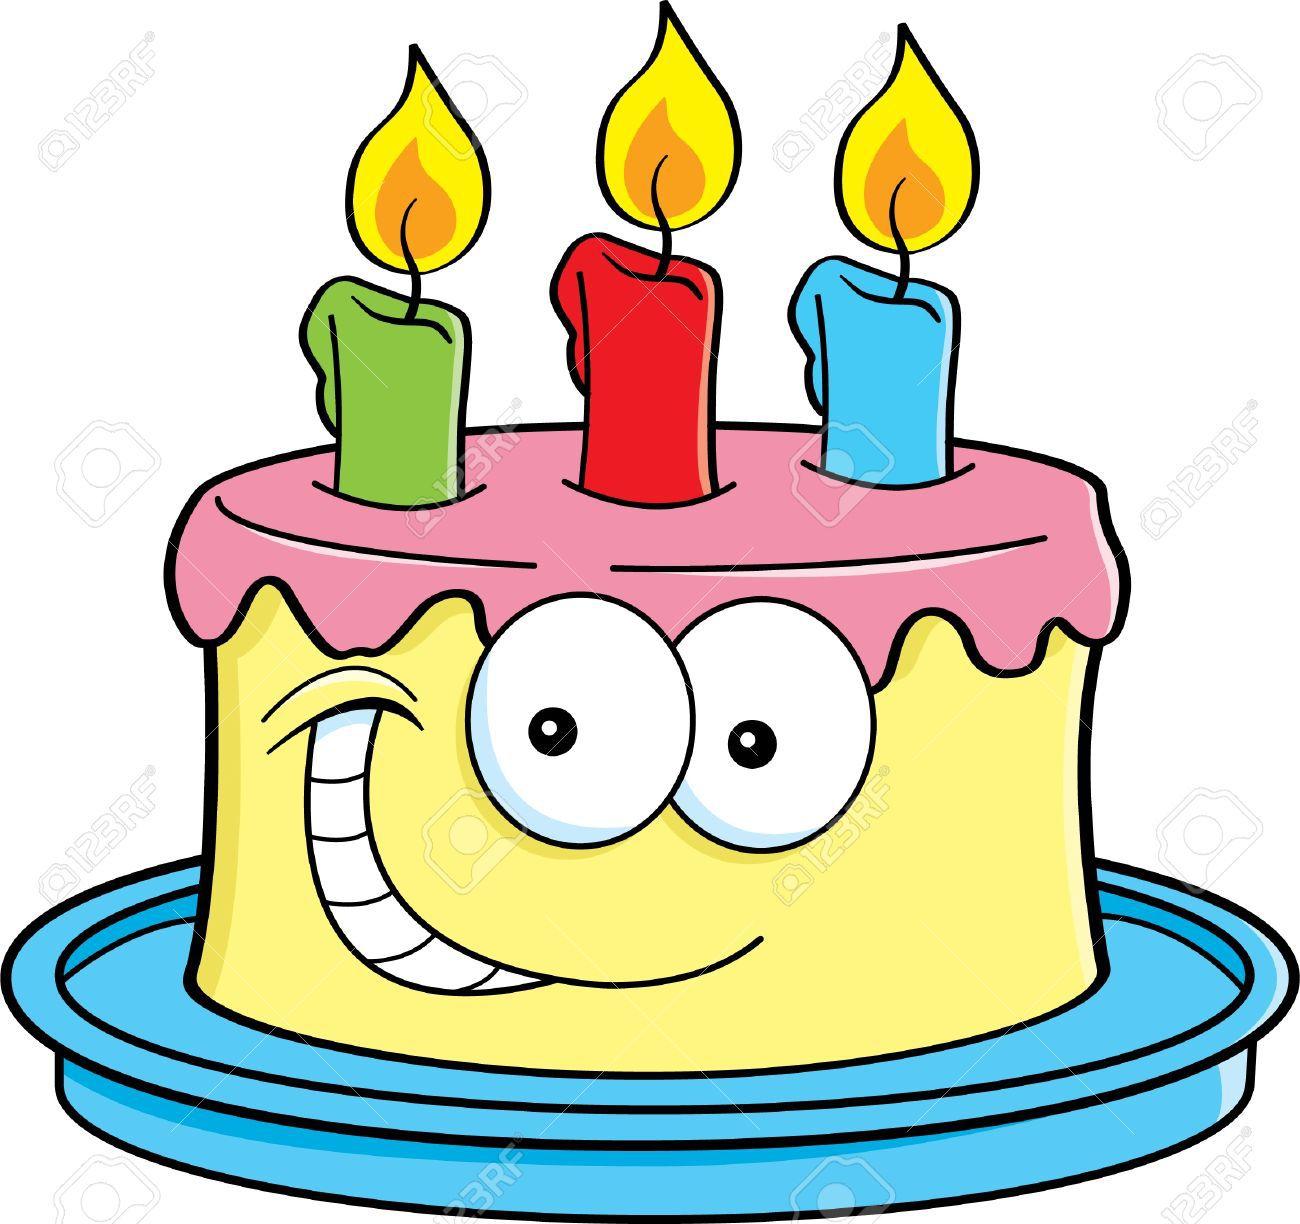 Cartoon Cakes - ClipArt Best